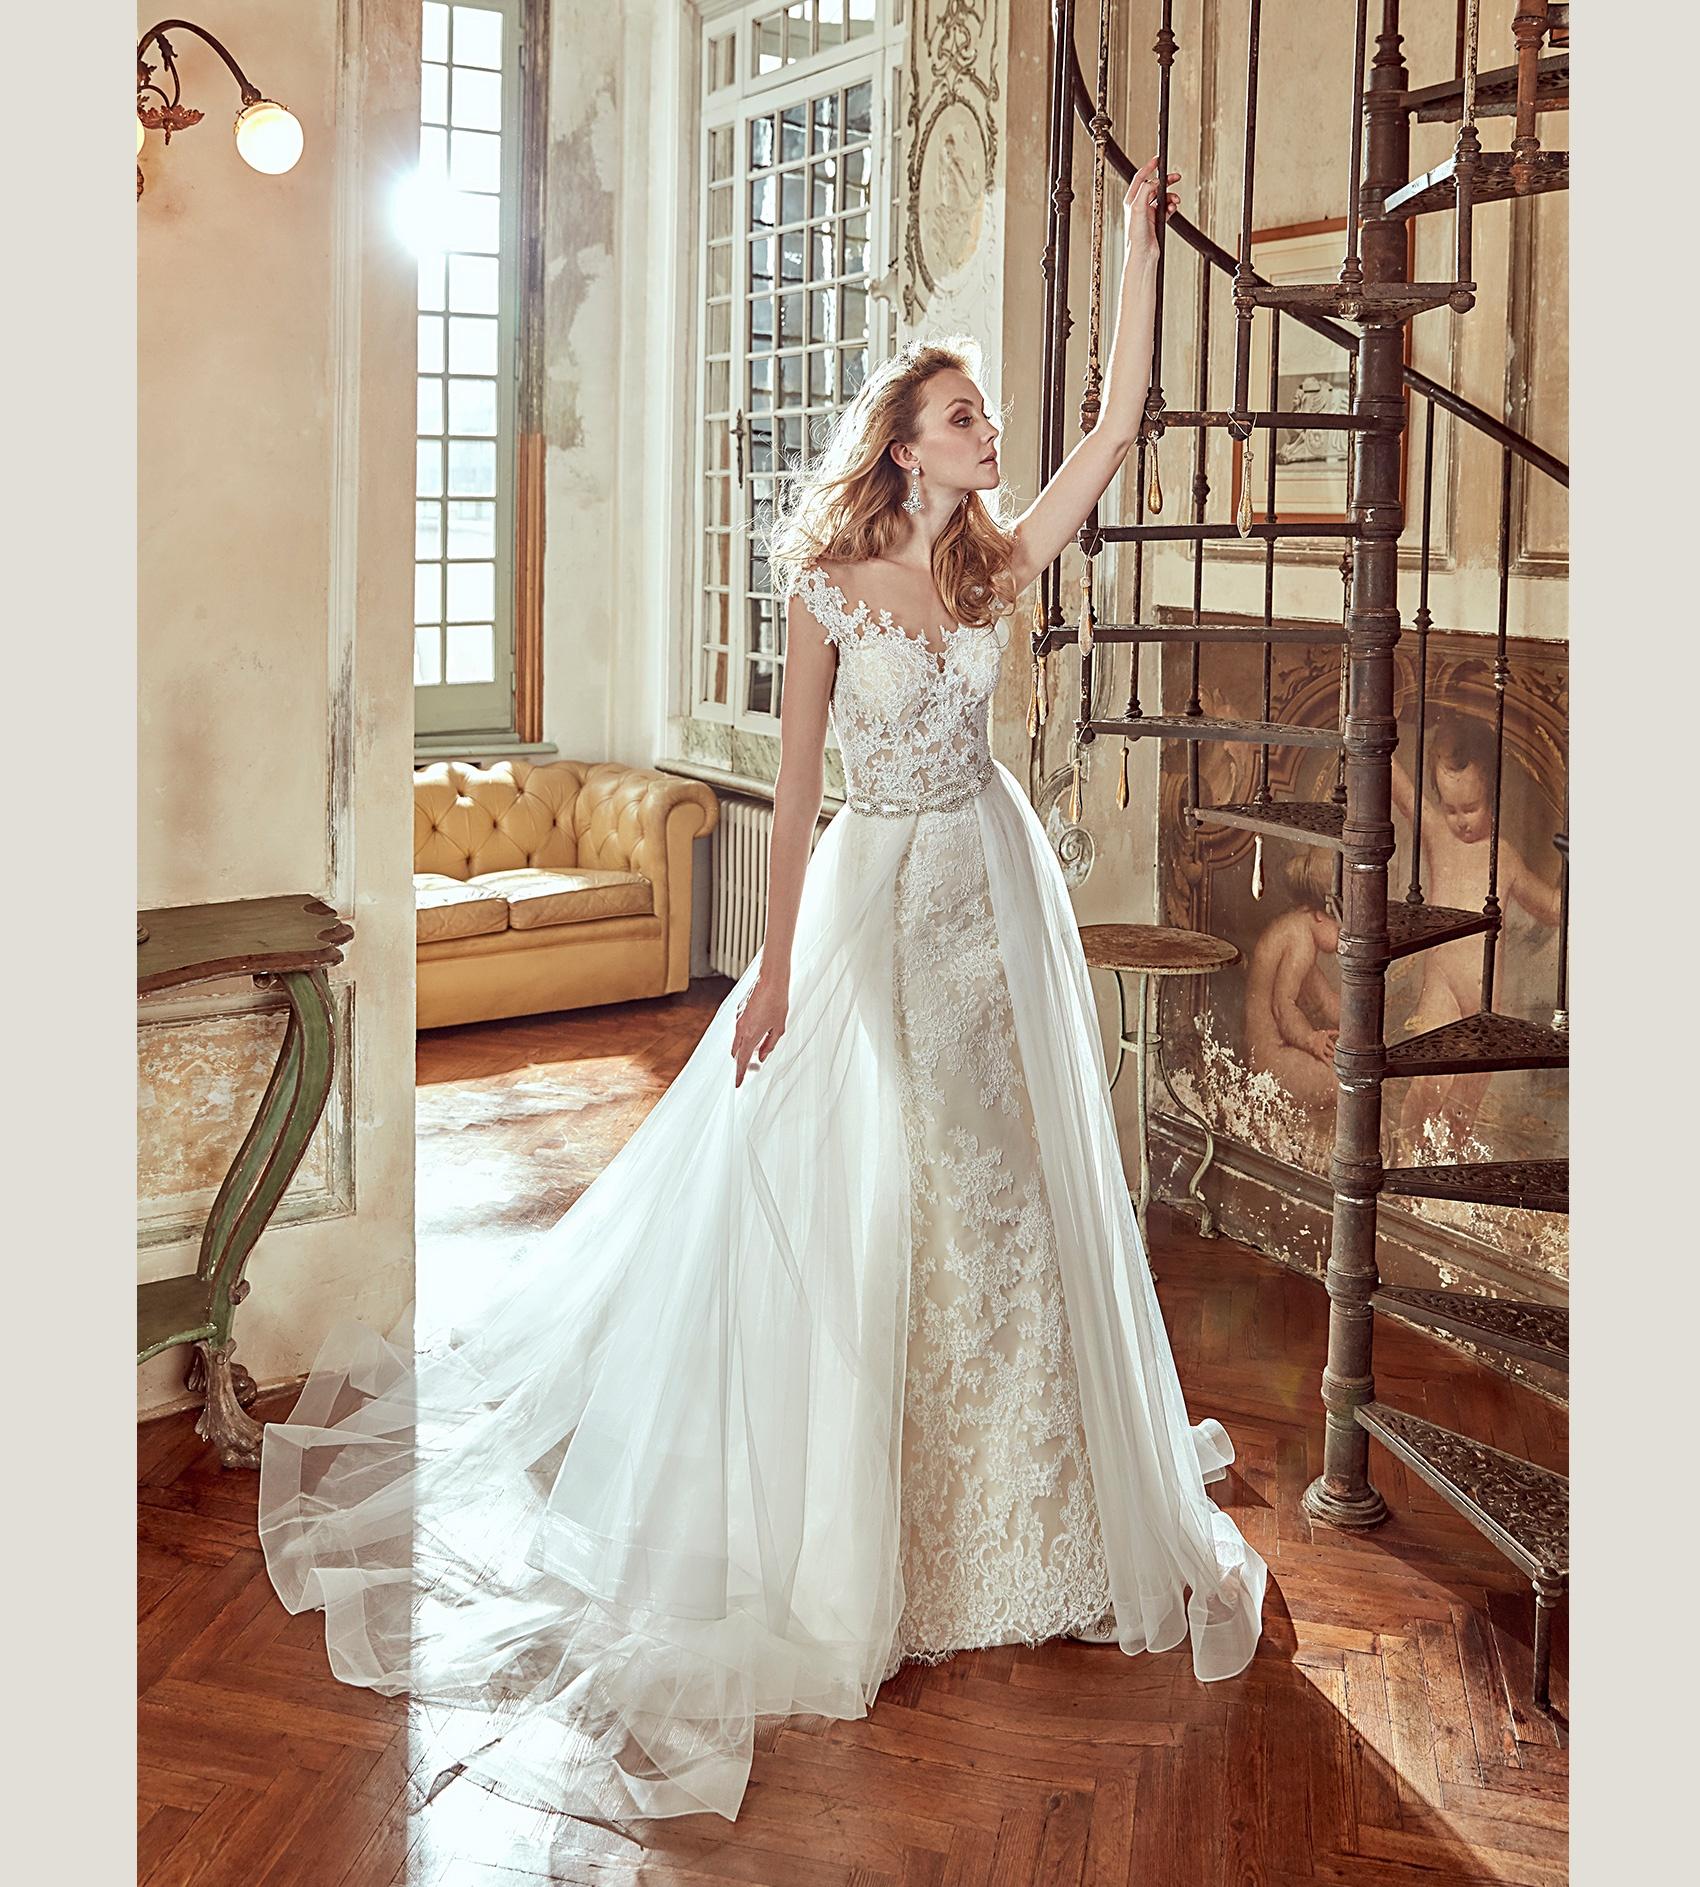 nicole-spose-NIAB17116-Nicole-moda-sposa-2017-194.jpg